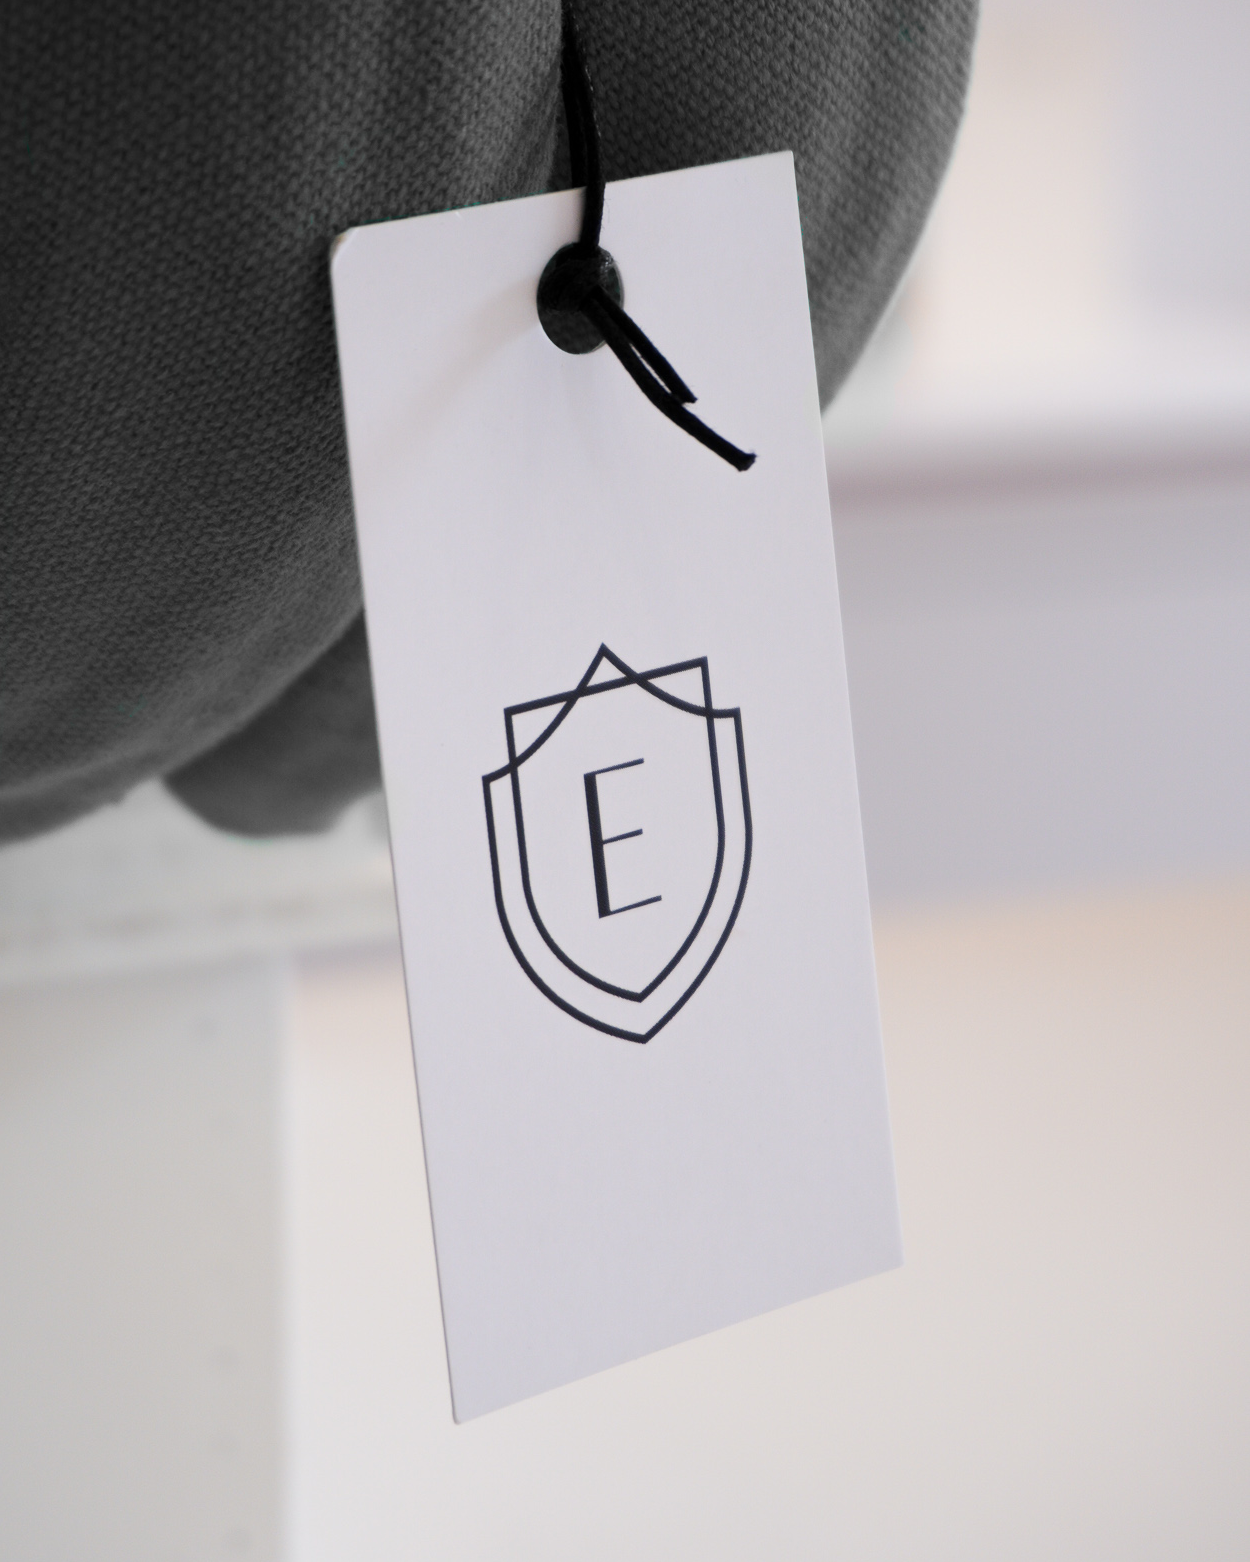 flourish-collaborative-edition-shop-retail-hangtags.png